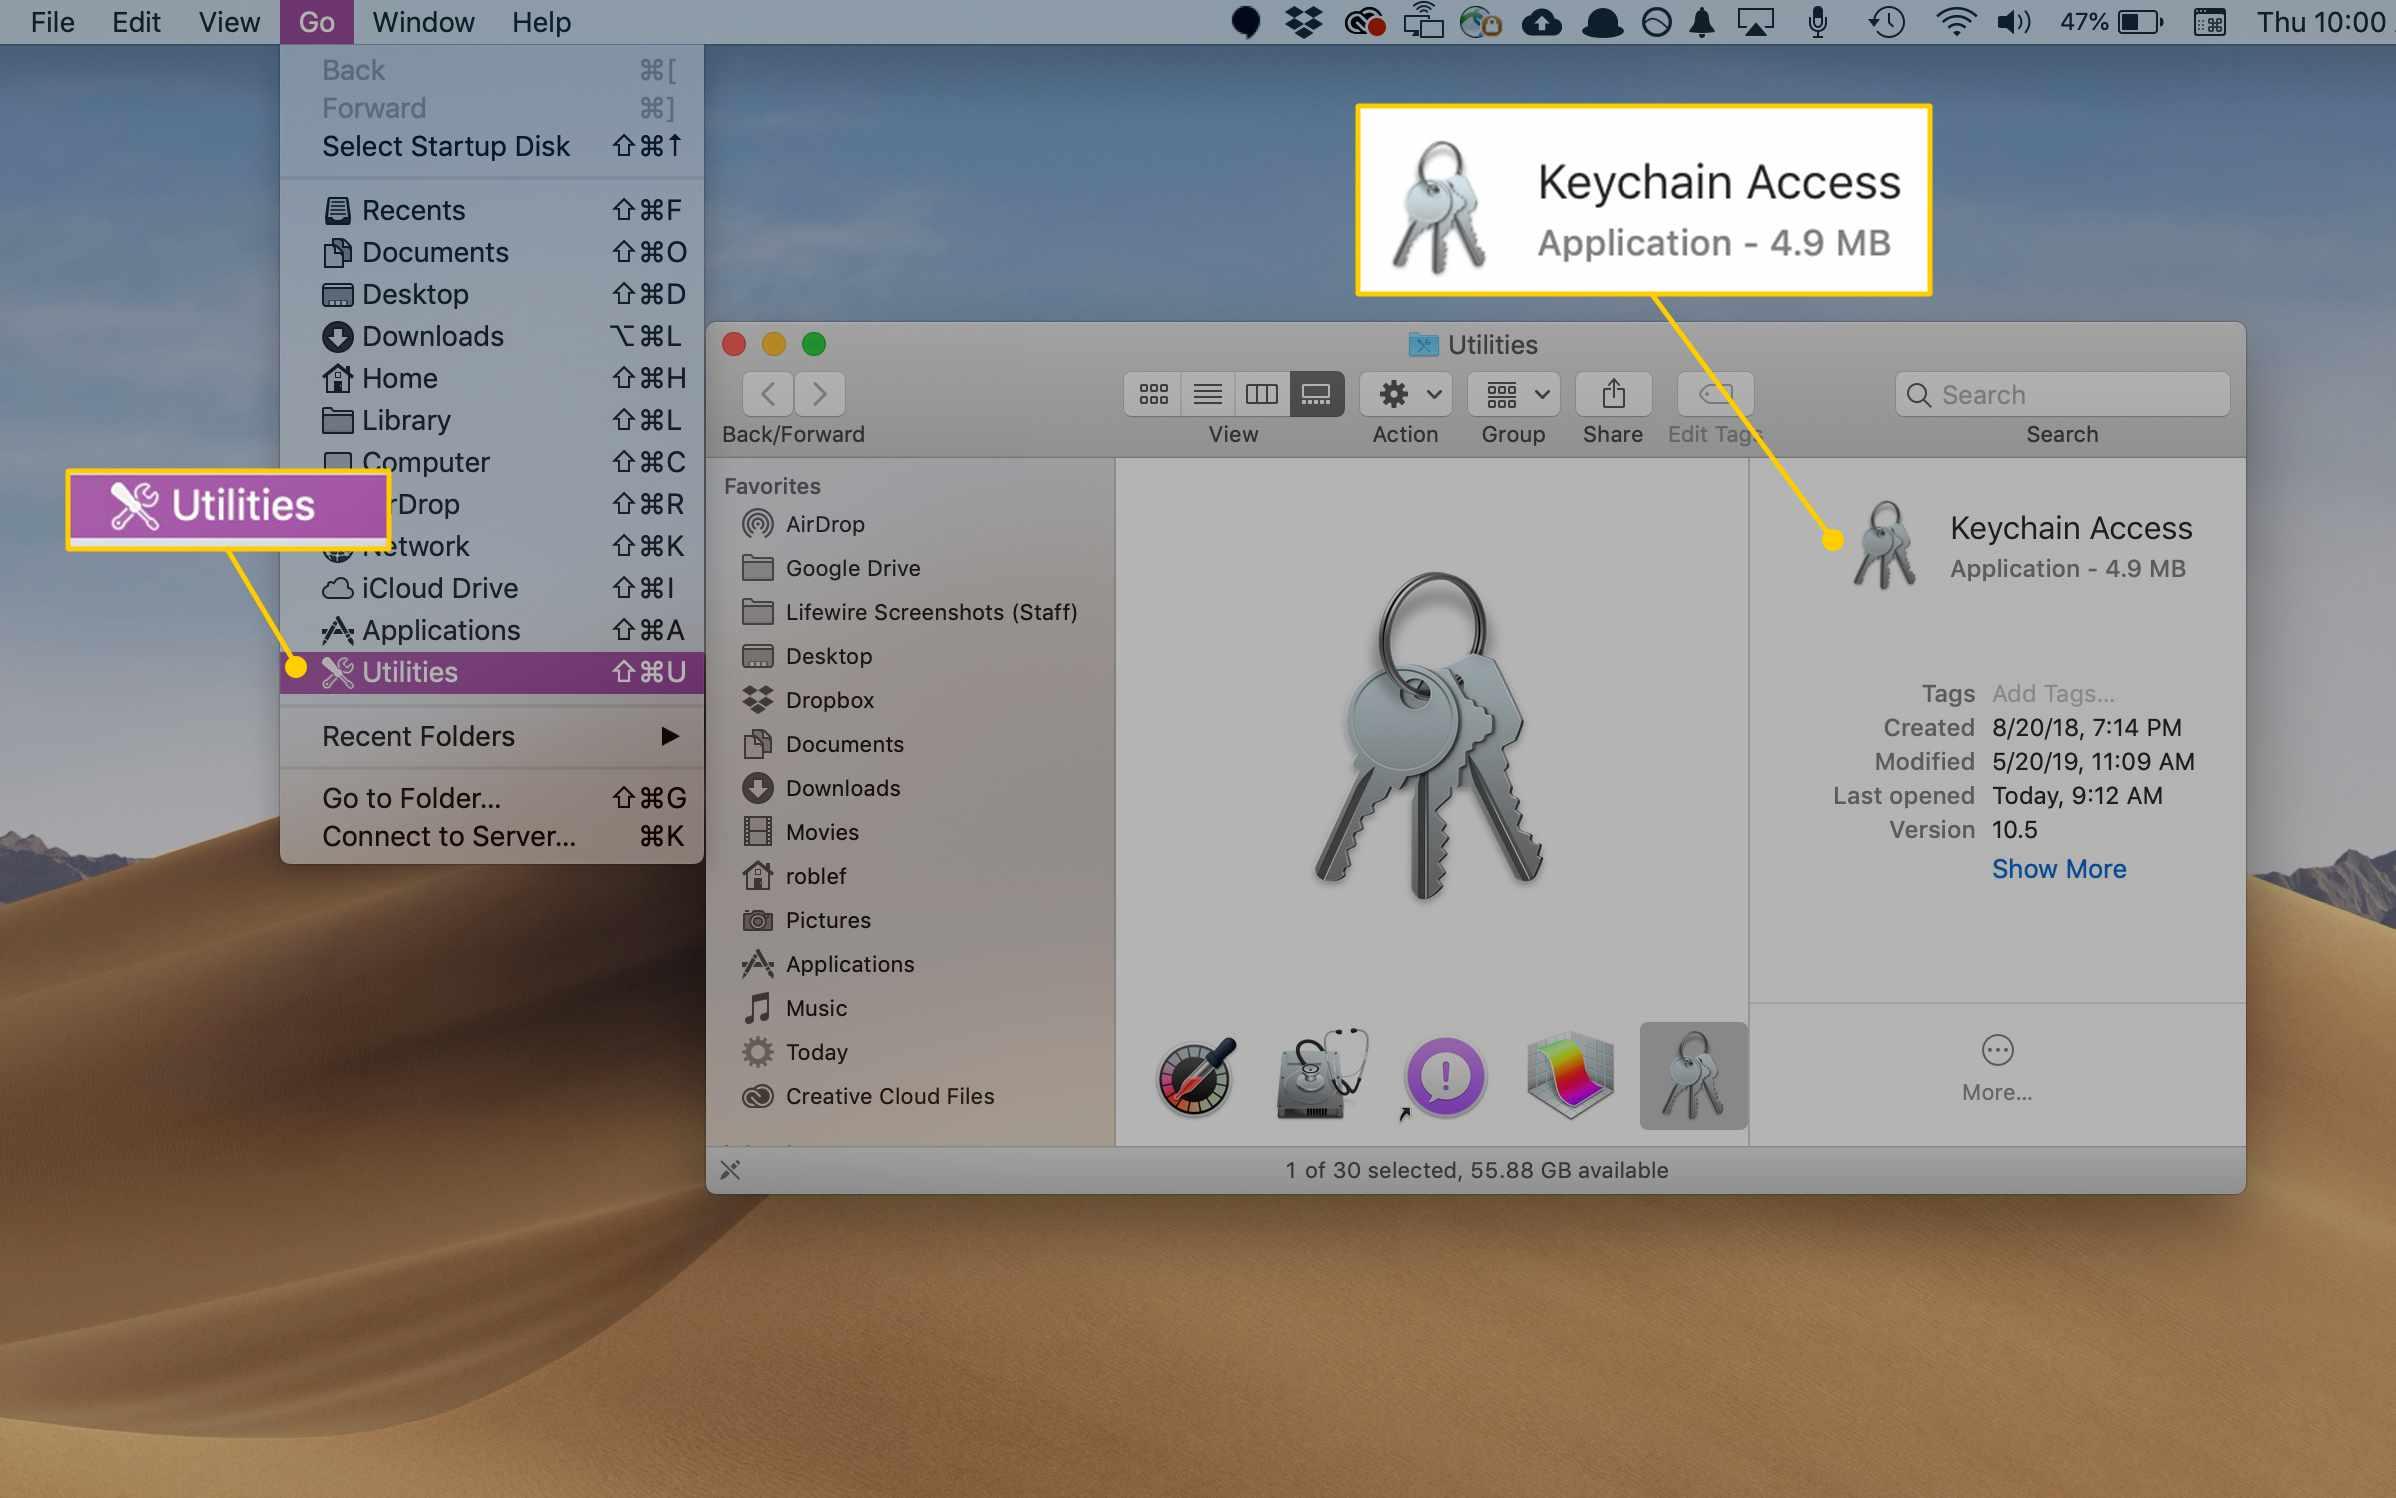 Utilities menu and Keychain Access app in macOS